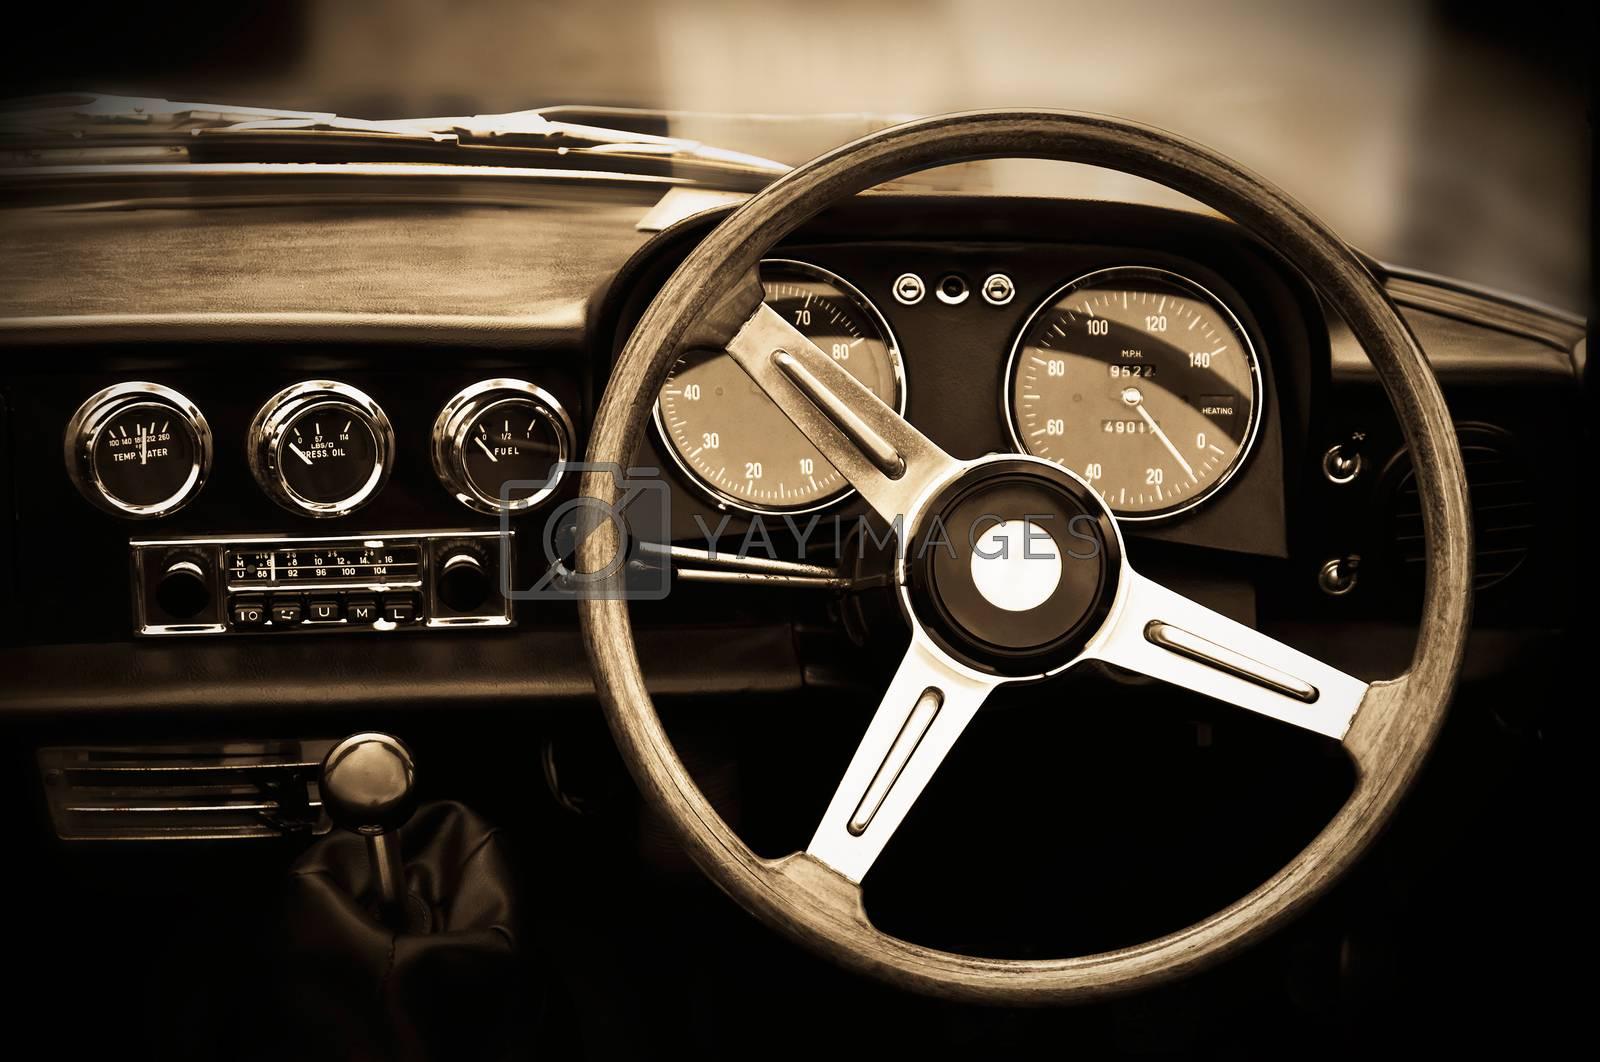 Vintage car dashboard, sepia toning